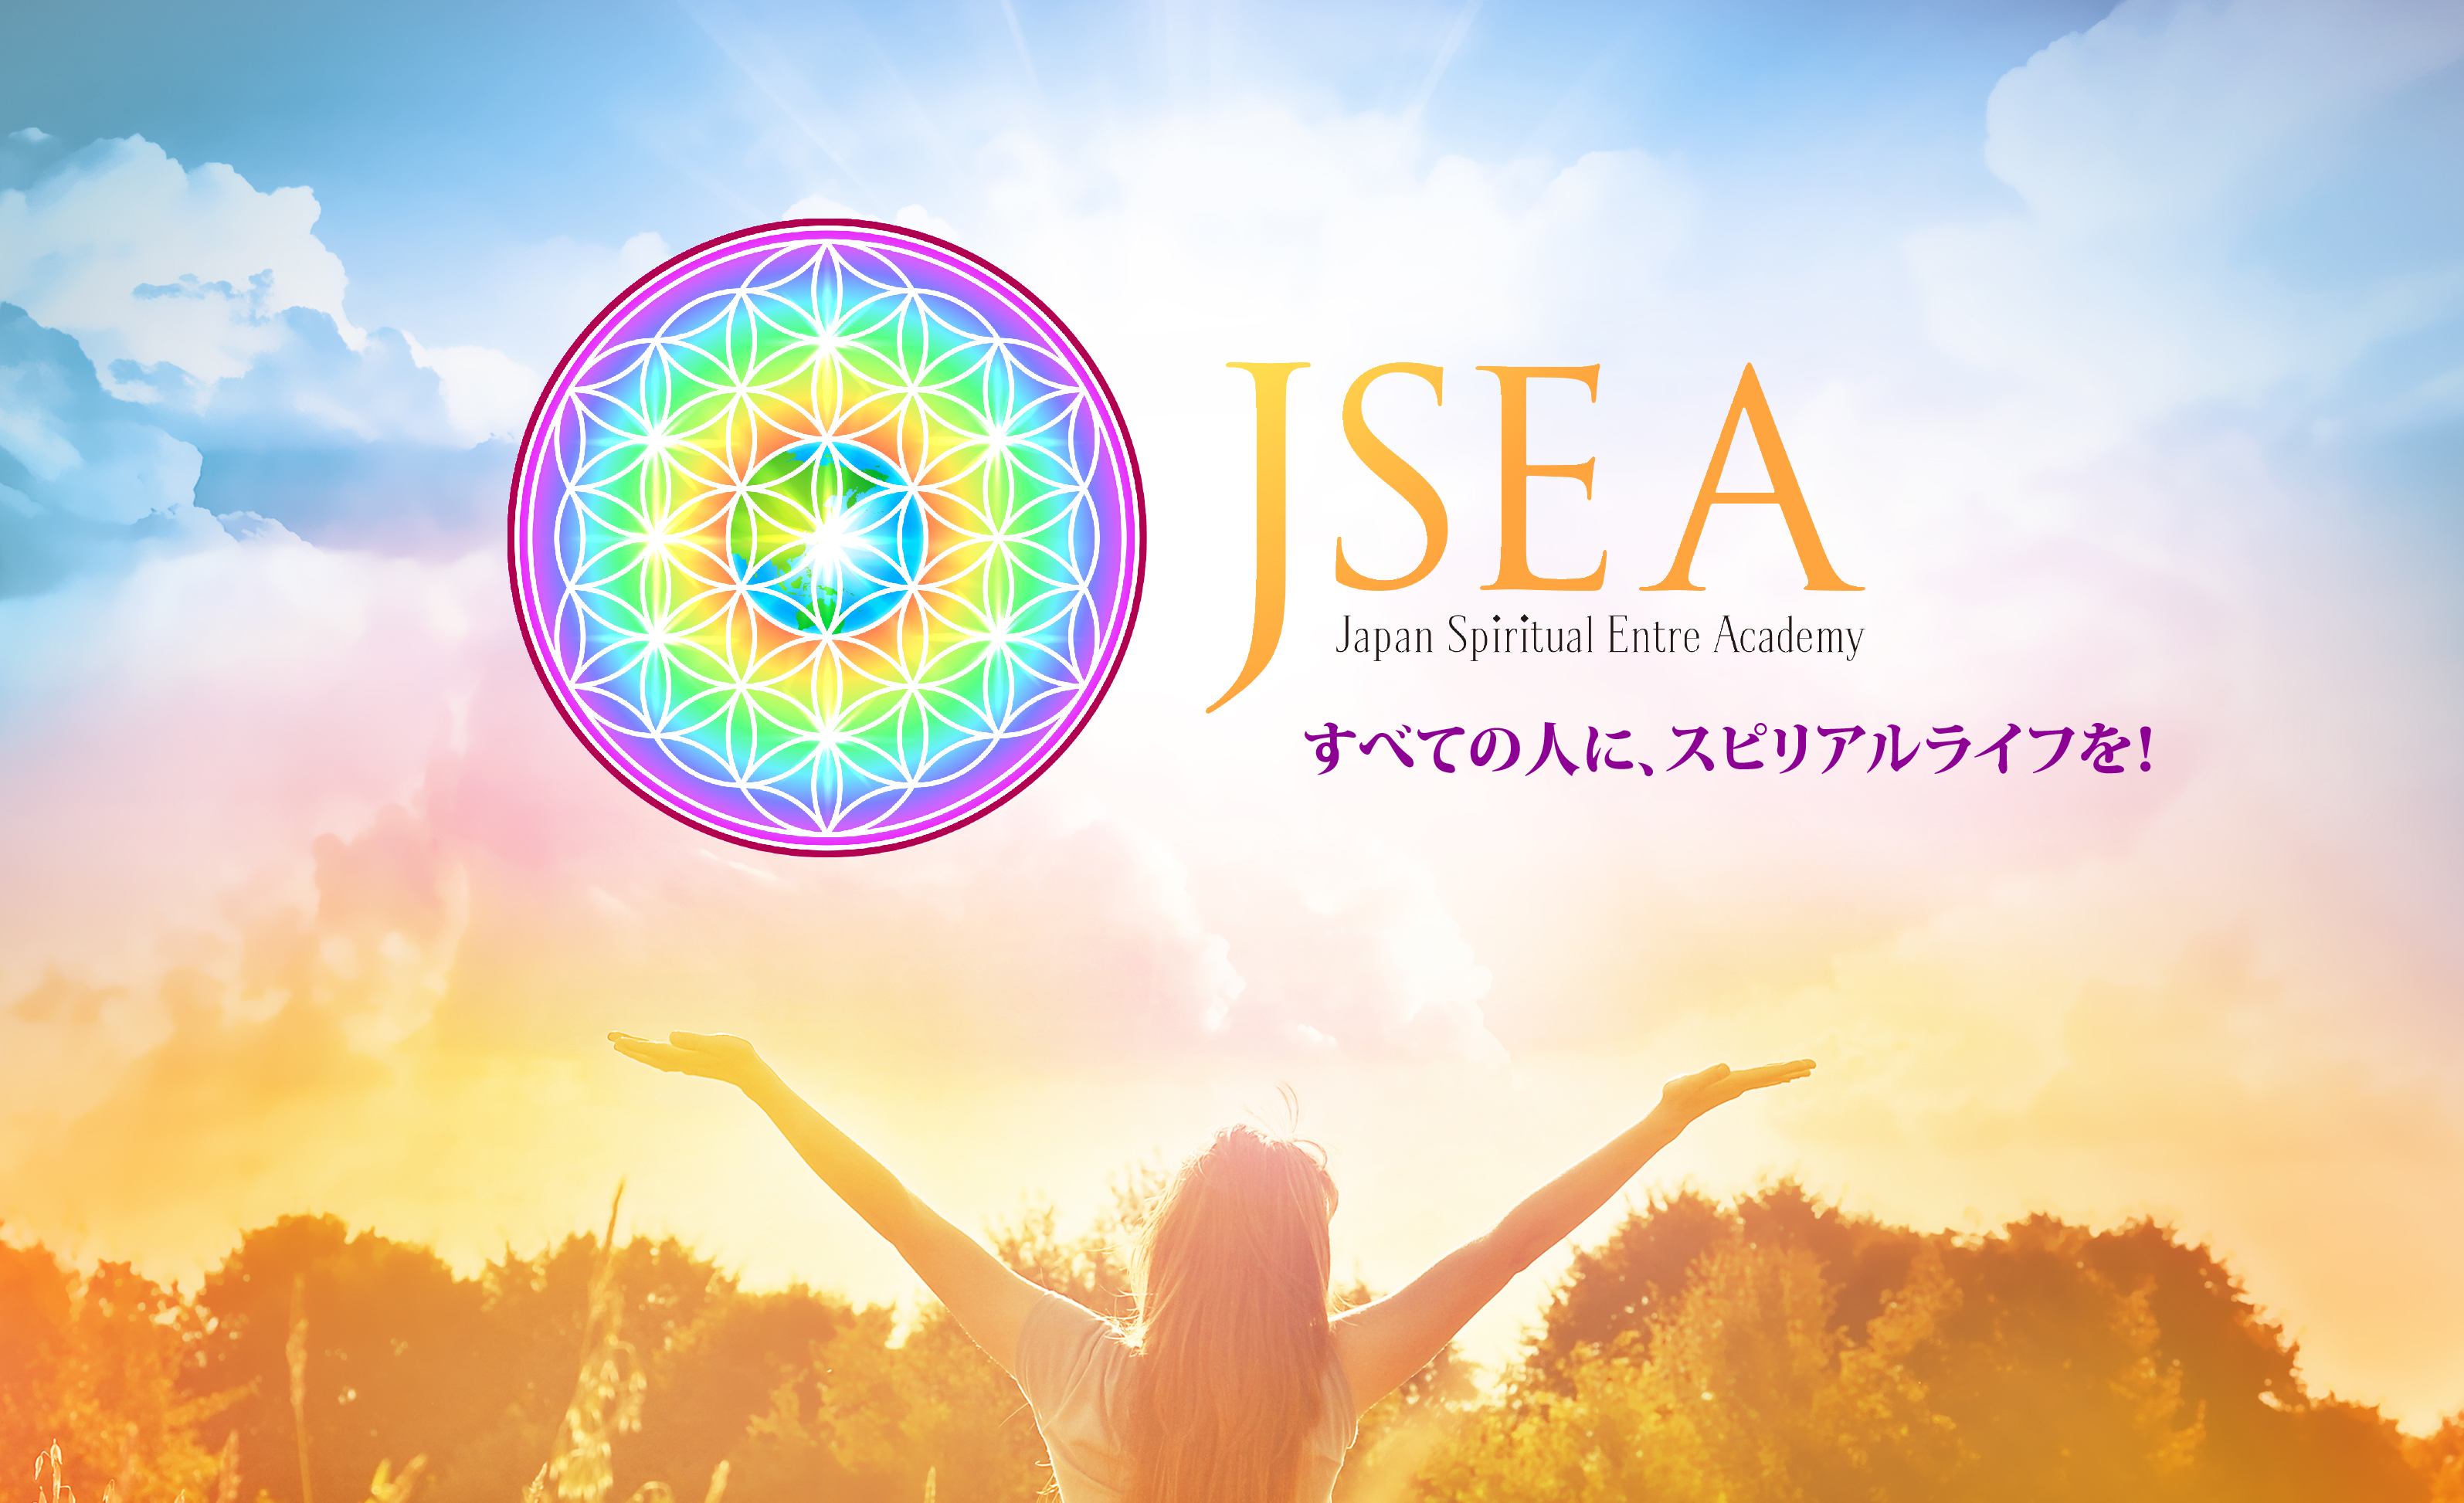 JSEA logo